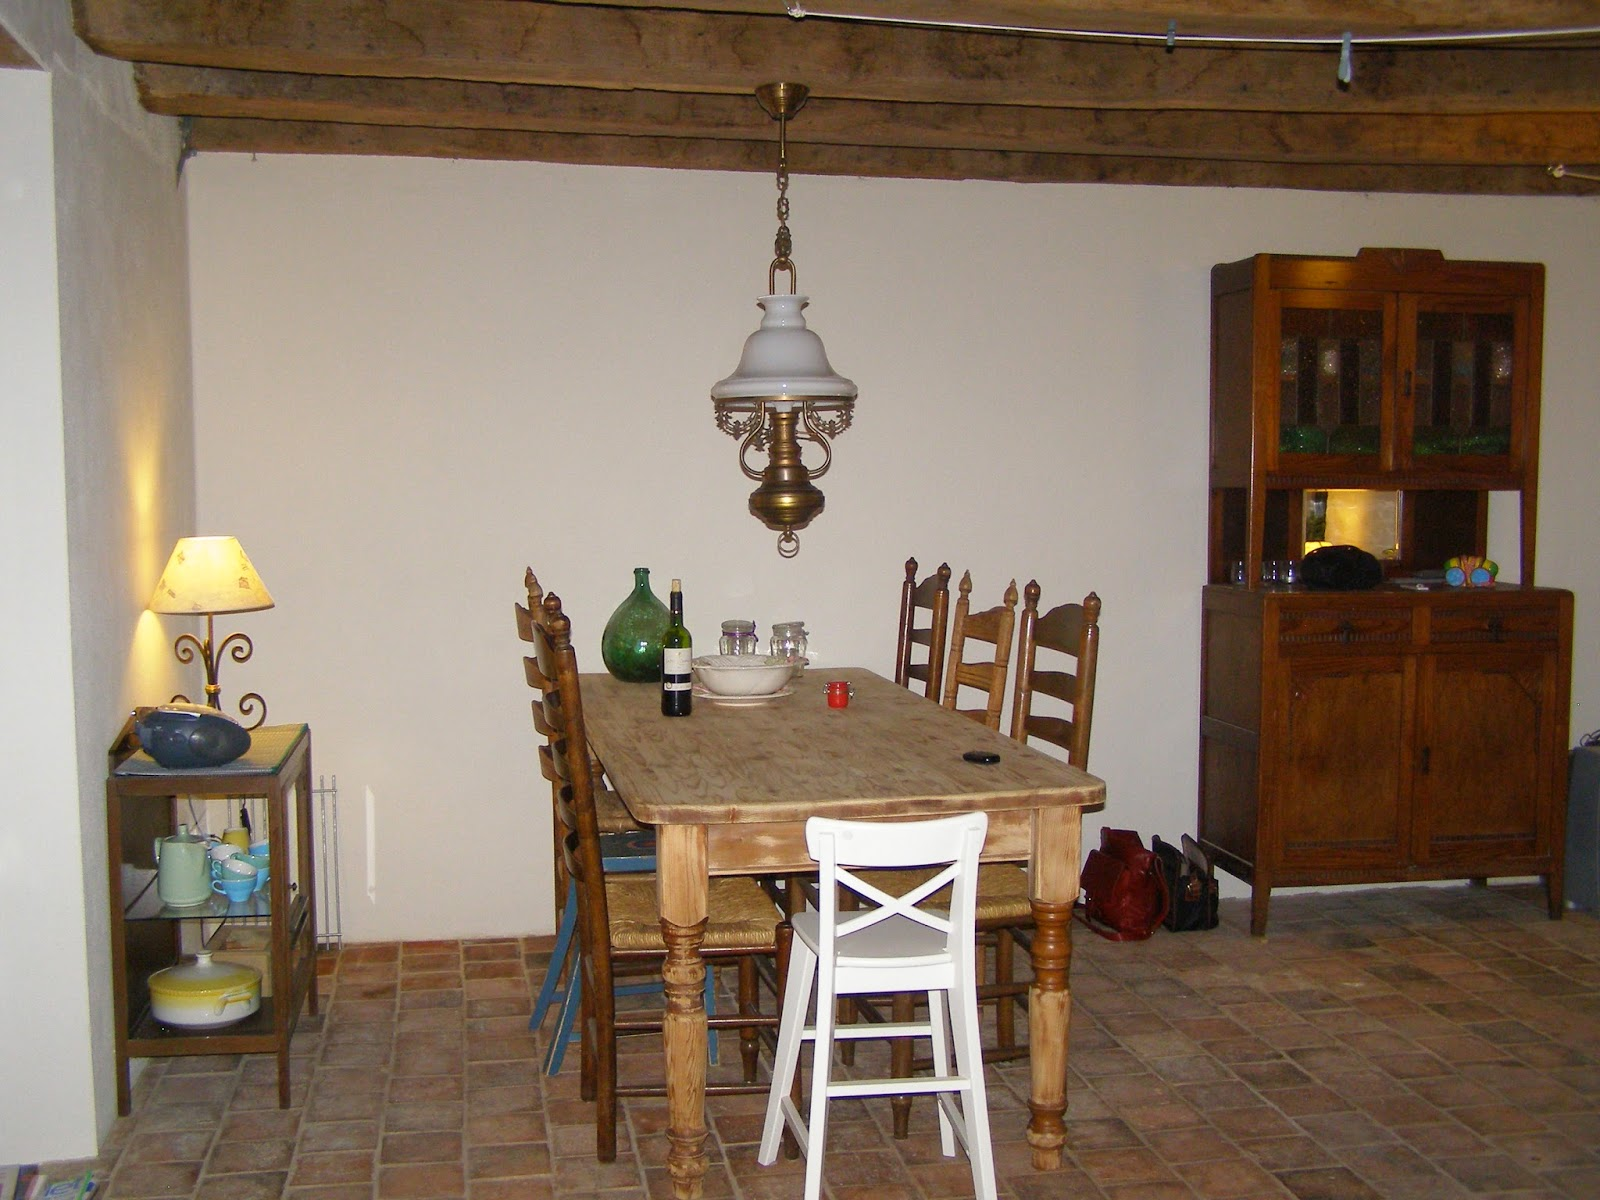 Bankje Slaapkamer Slaapkamers : Pignachat: de boerderij